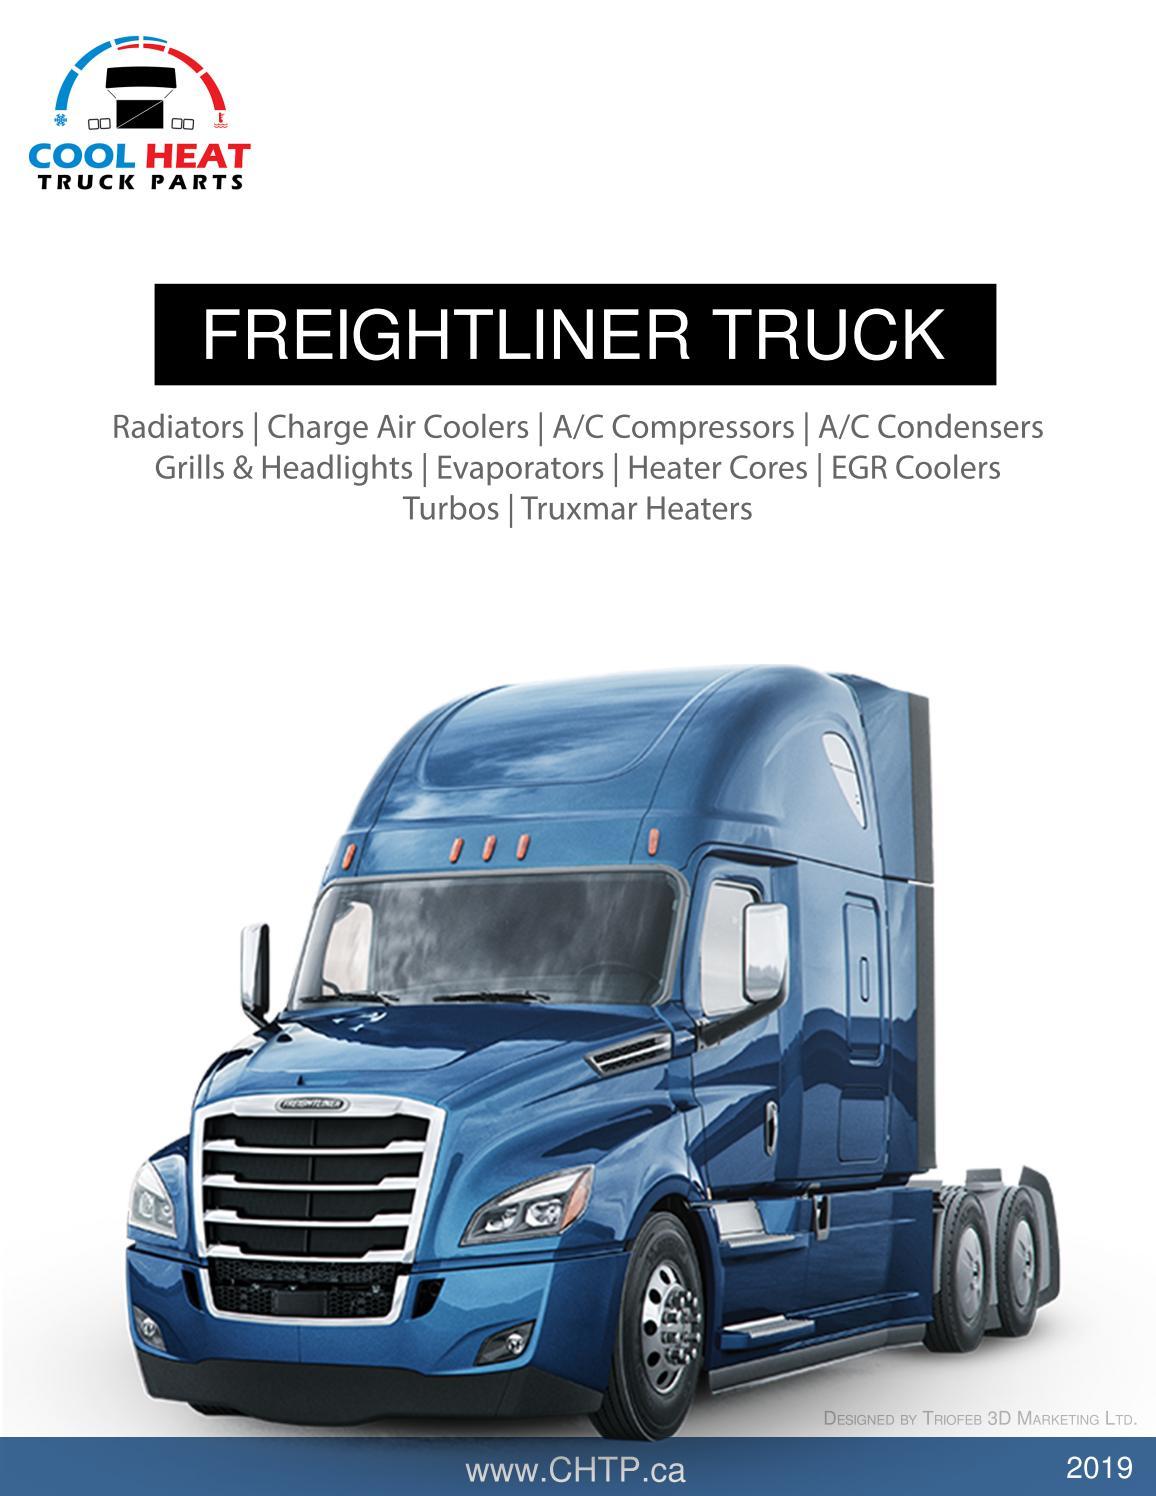 Freightliner Truck Parts by Amir Wihan - issuu